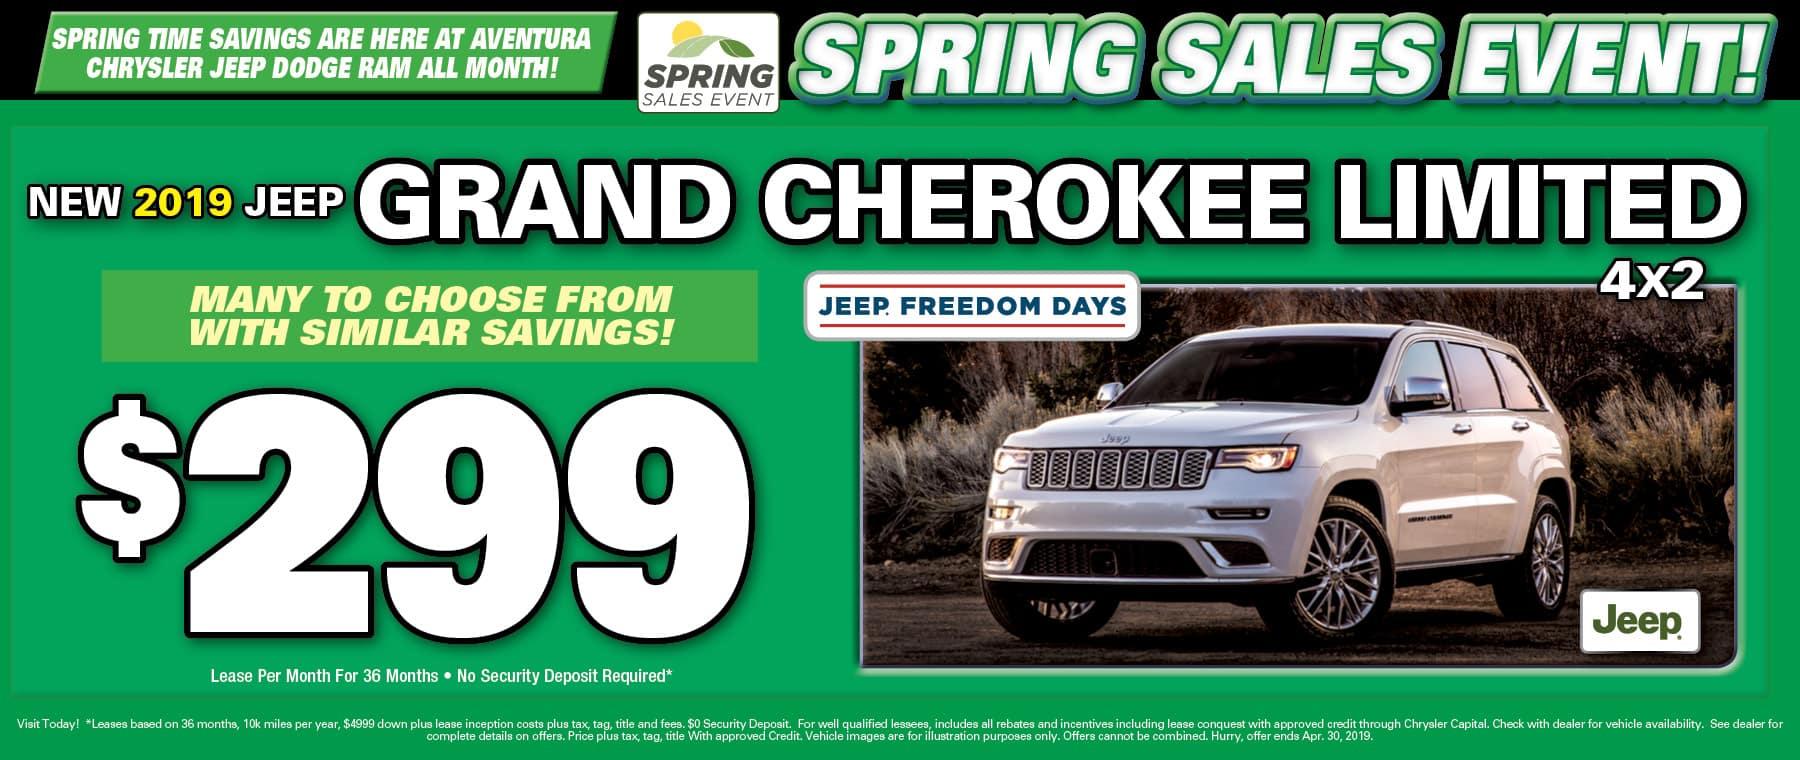 2019 Jeep Grand Cherokee!